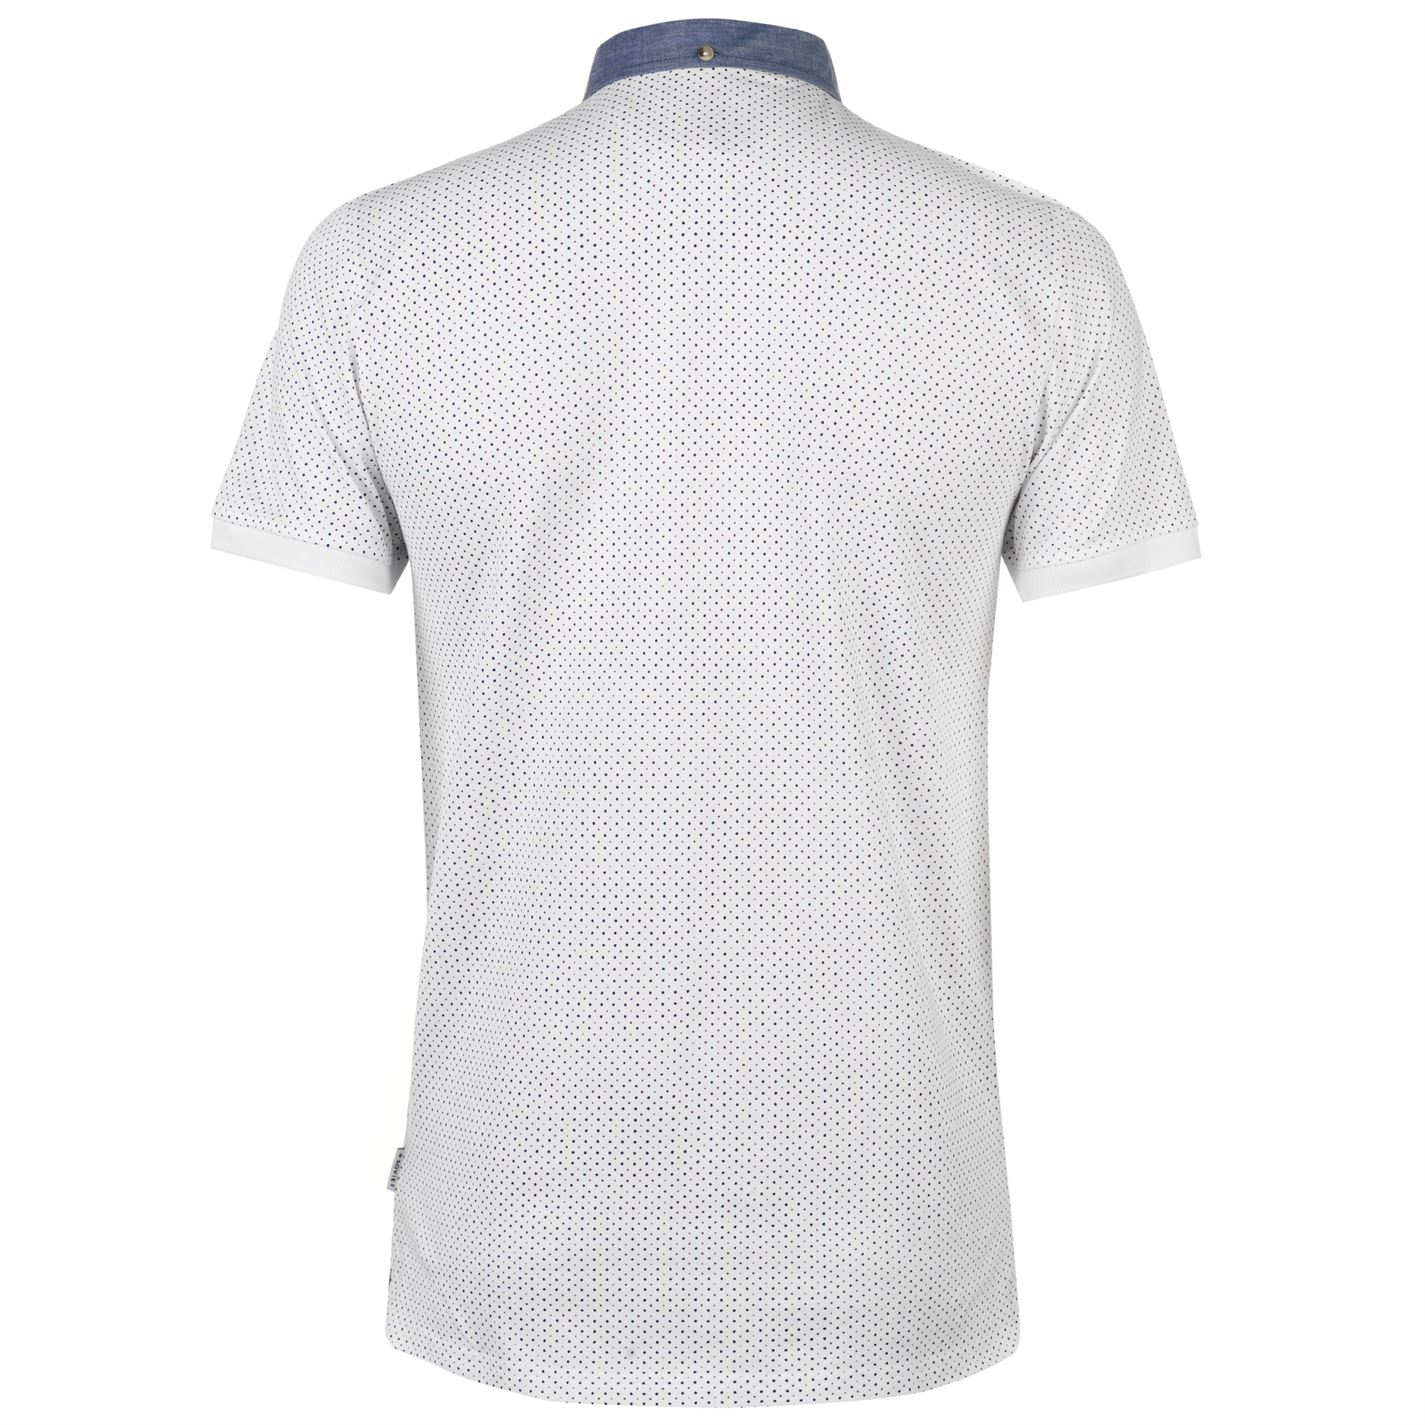 POLO CHAMB SOVIETICA Uomo Gents Slim Fit Shirt Tee Top